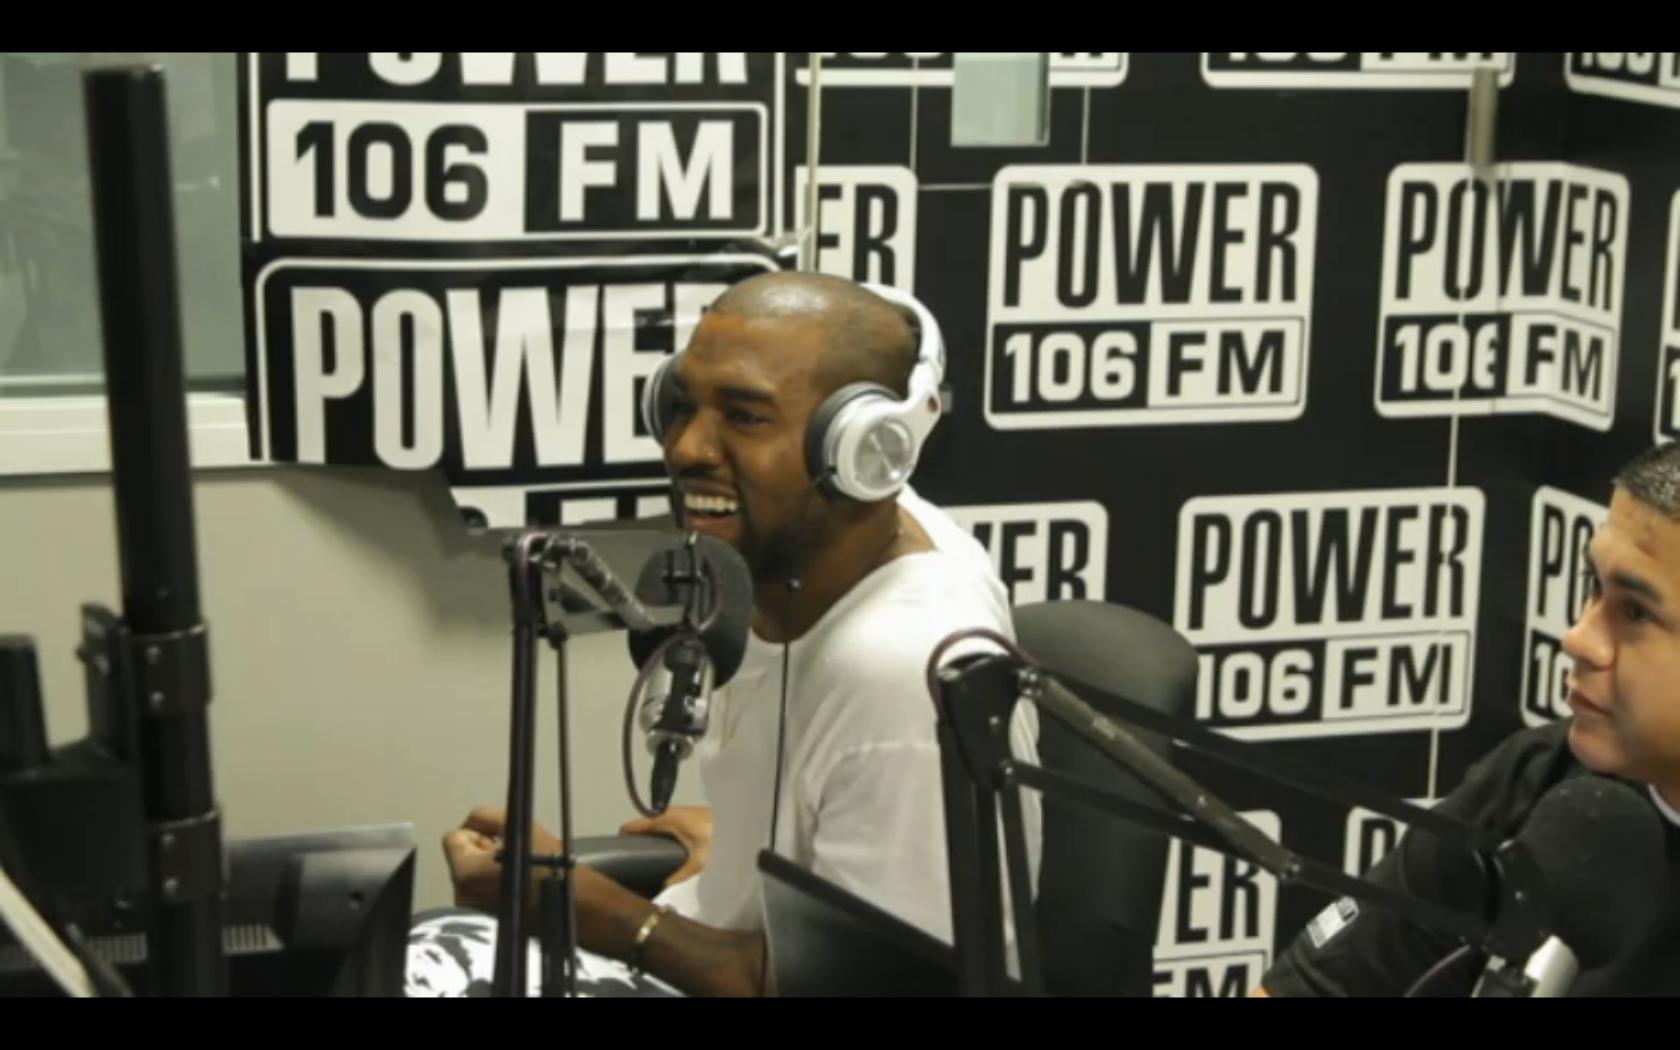 Kanye Discusses <em>Yeezus</em> Leftovers And Wedding Plans, Praises Tyler, The Creator In Radio Interviews